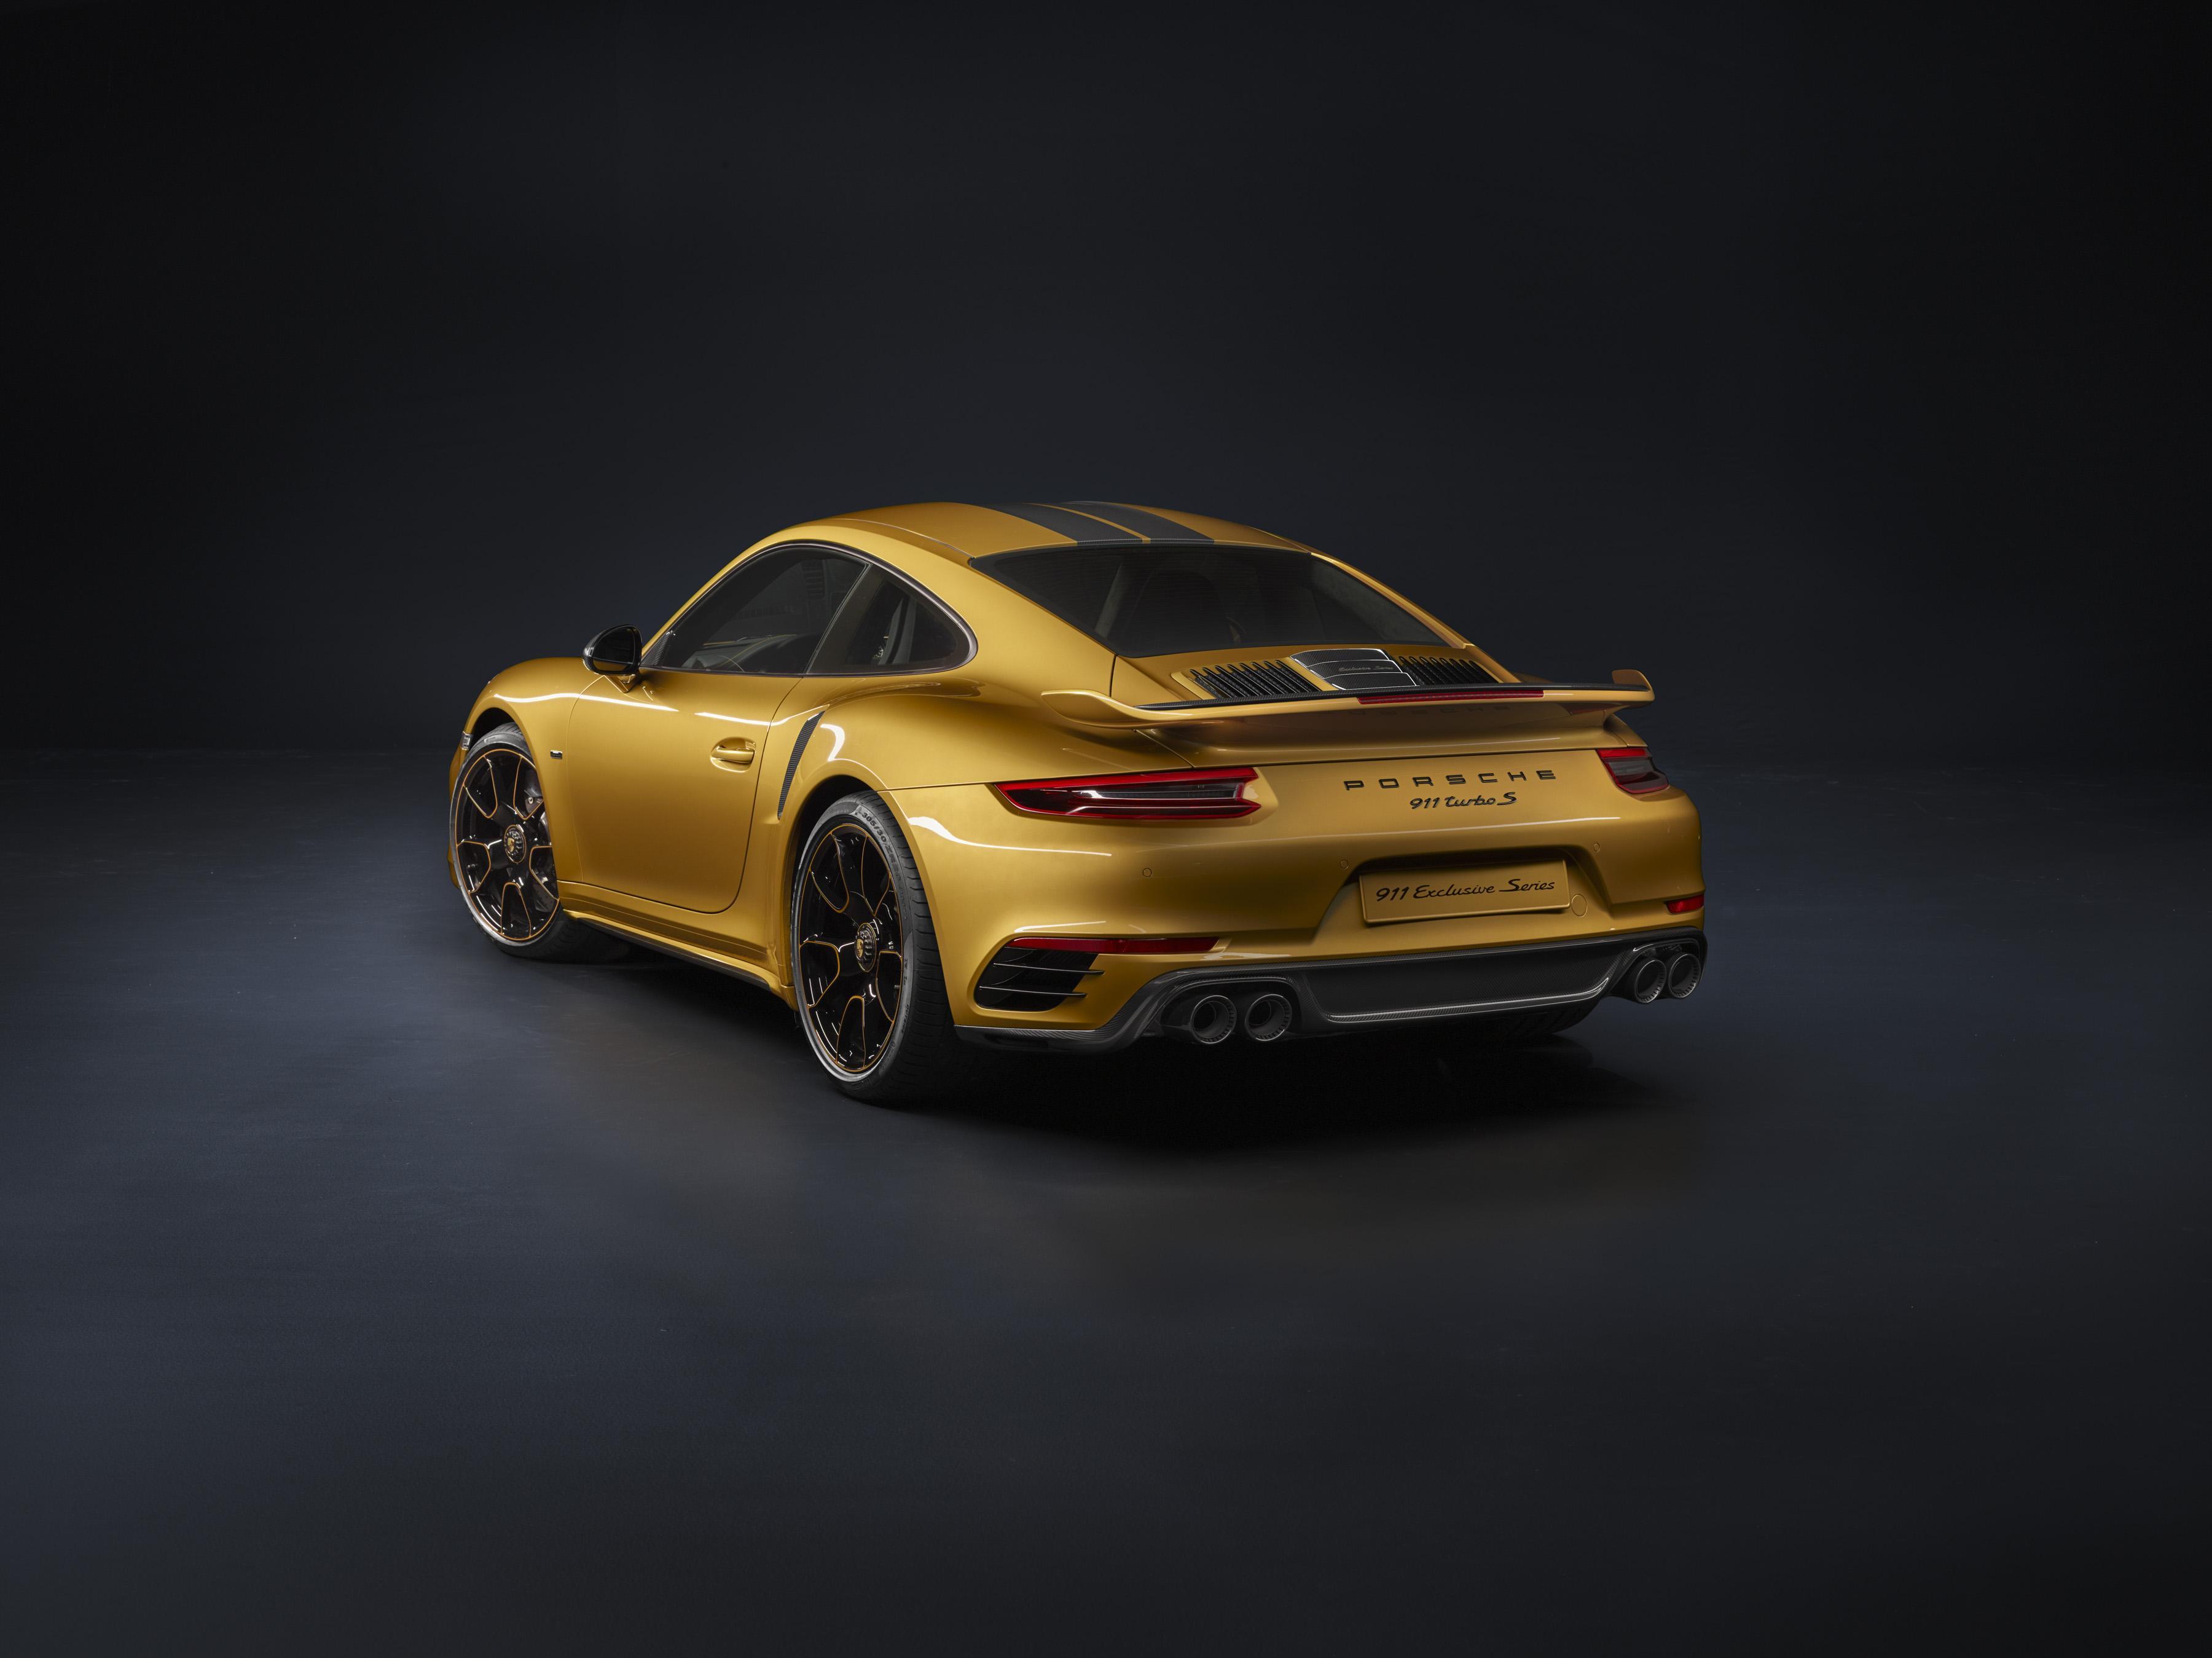 Porsche 911 Turbo S Wallpapers Top Free Porsche 911 Turbo S Backgrounds Wallpaperaccess